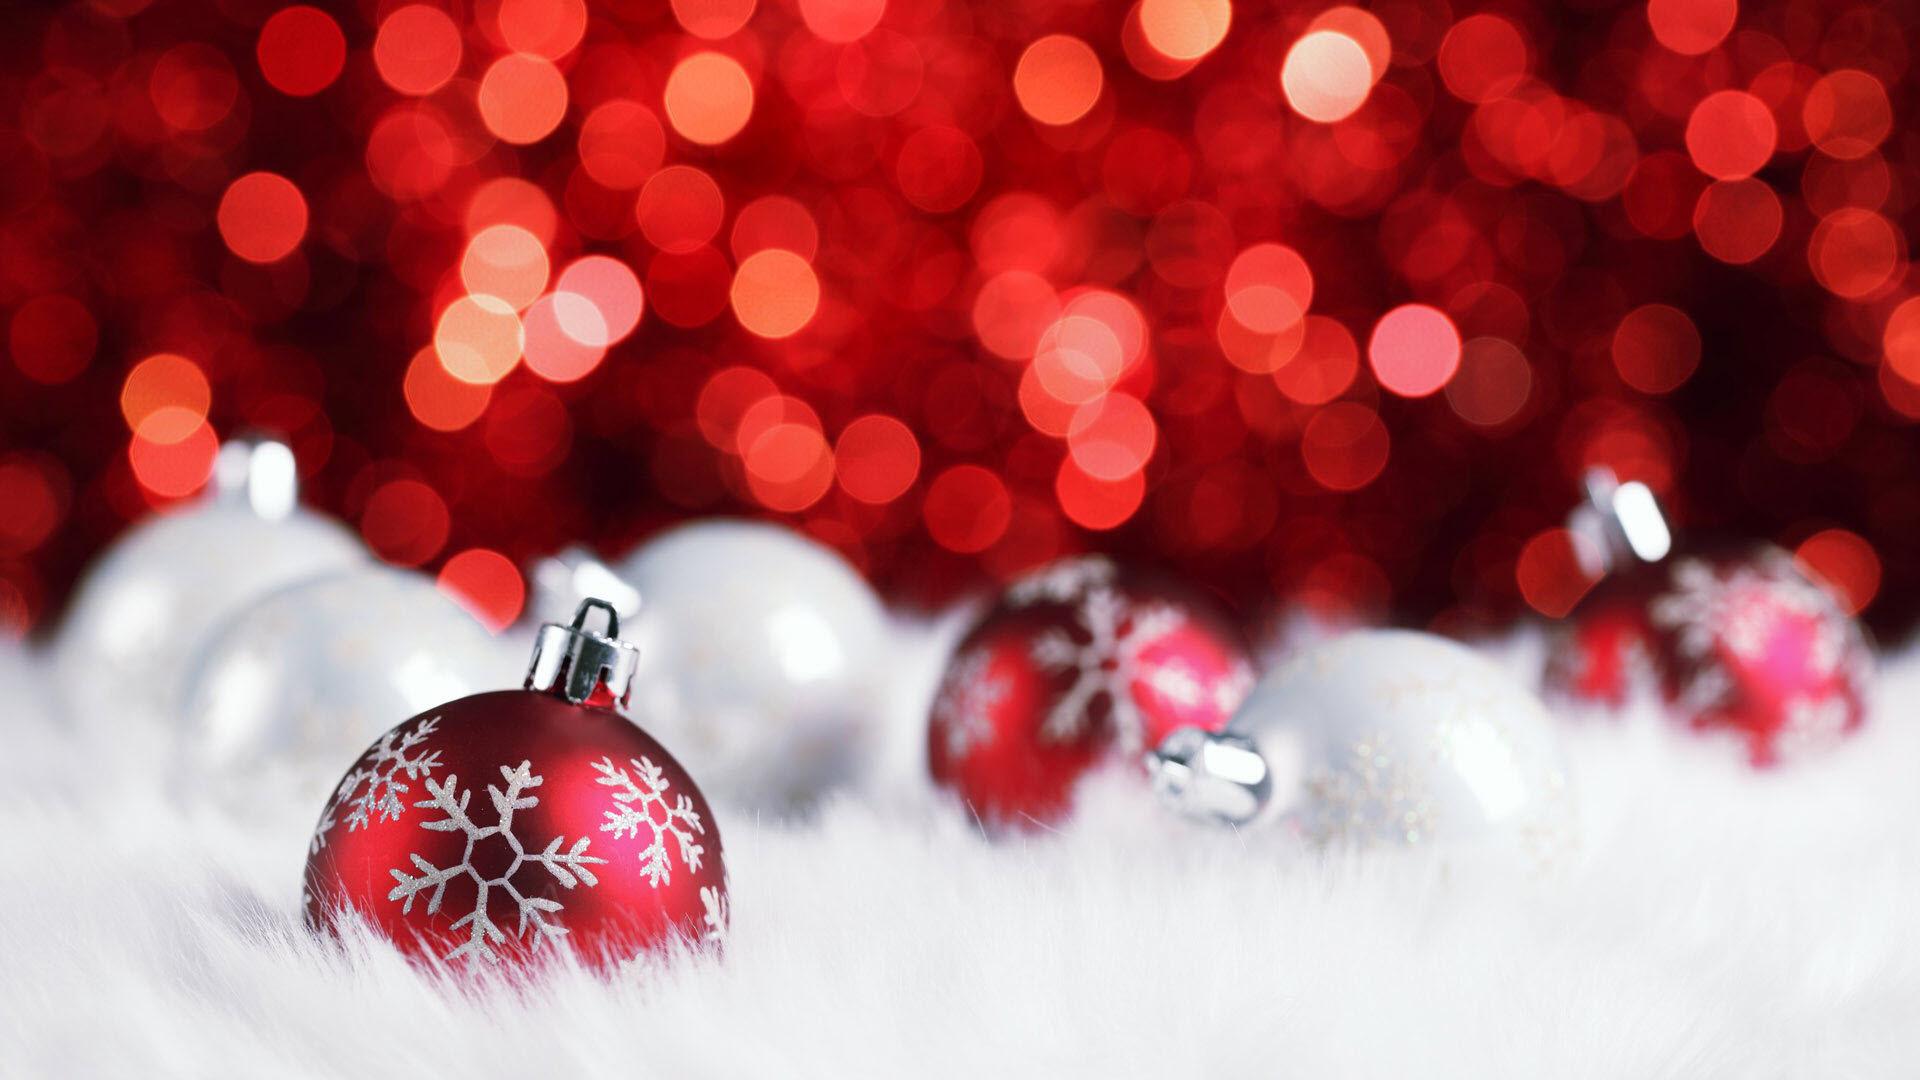 Christmas   Christmas Winter Backgrounds For Desktop 883366 1920x1080